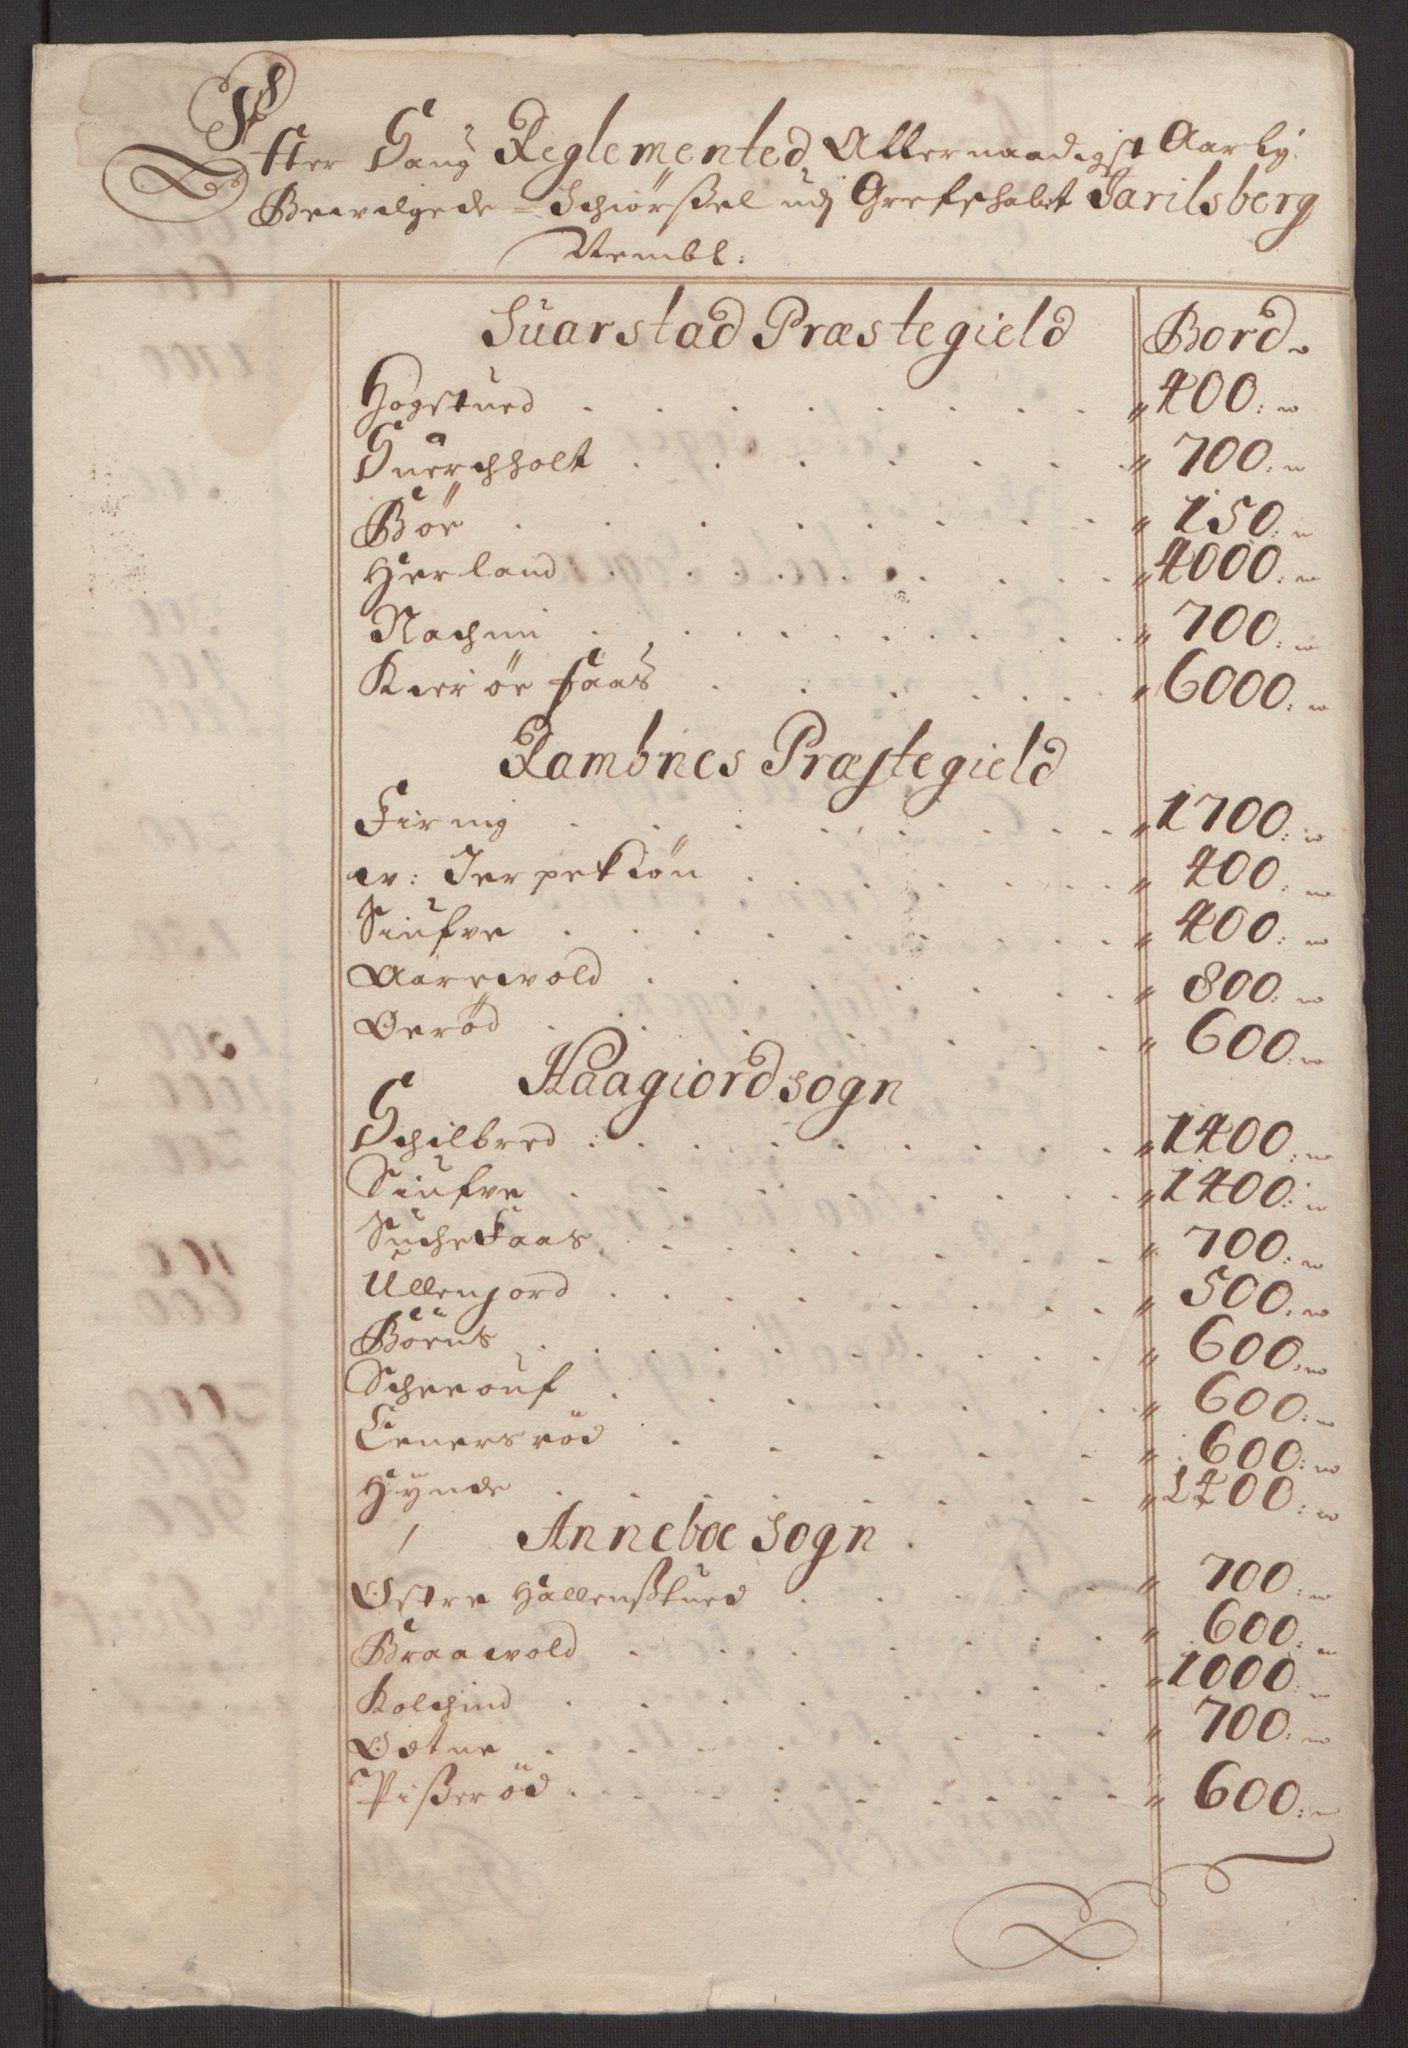 RA, Rentekammeret inntil 1814, Reviderte regnskaper, Fogderegnskap, R32/L1867: Fogderegnskap Jarlsberg grevskap, 1694-1696, s. 272